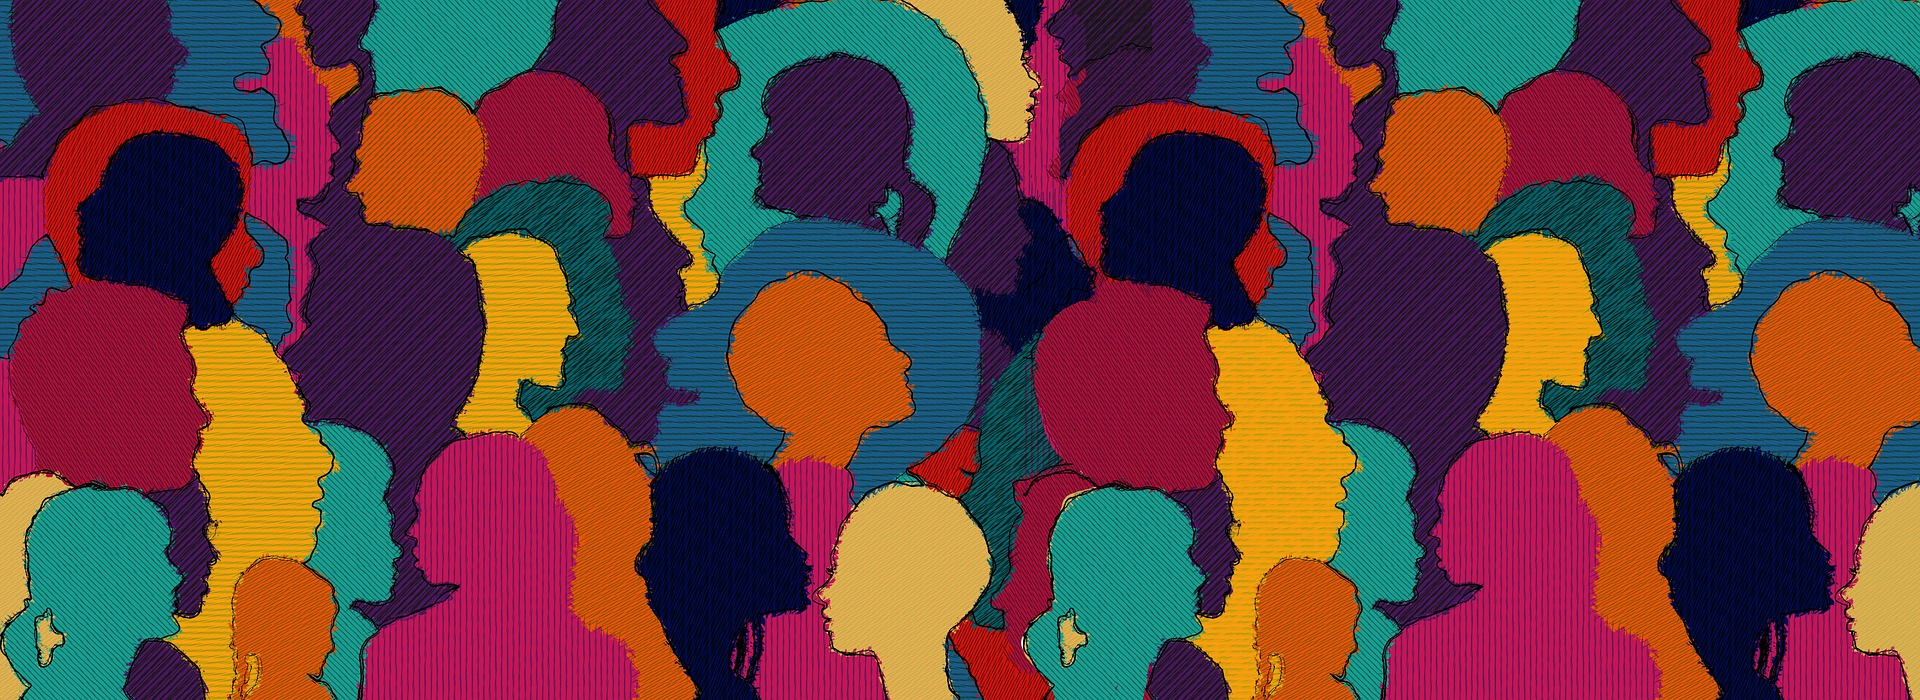 Are Catholics Countercultural?